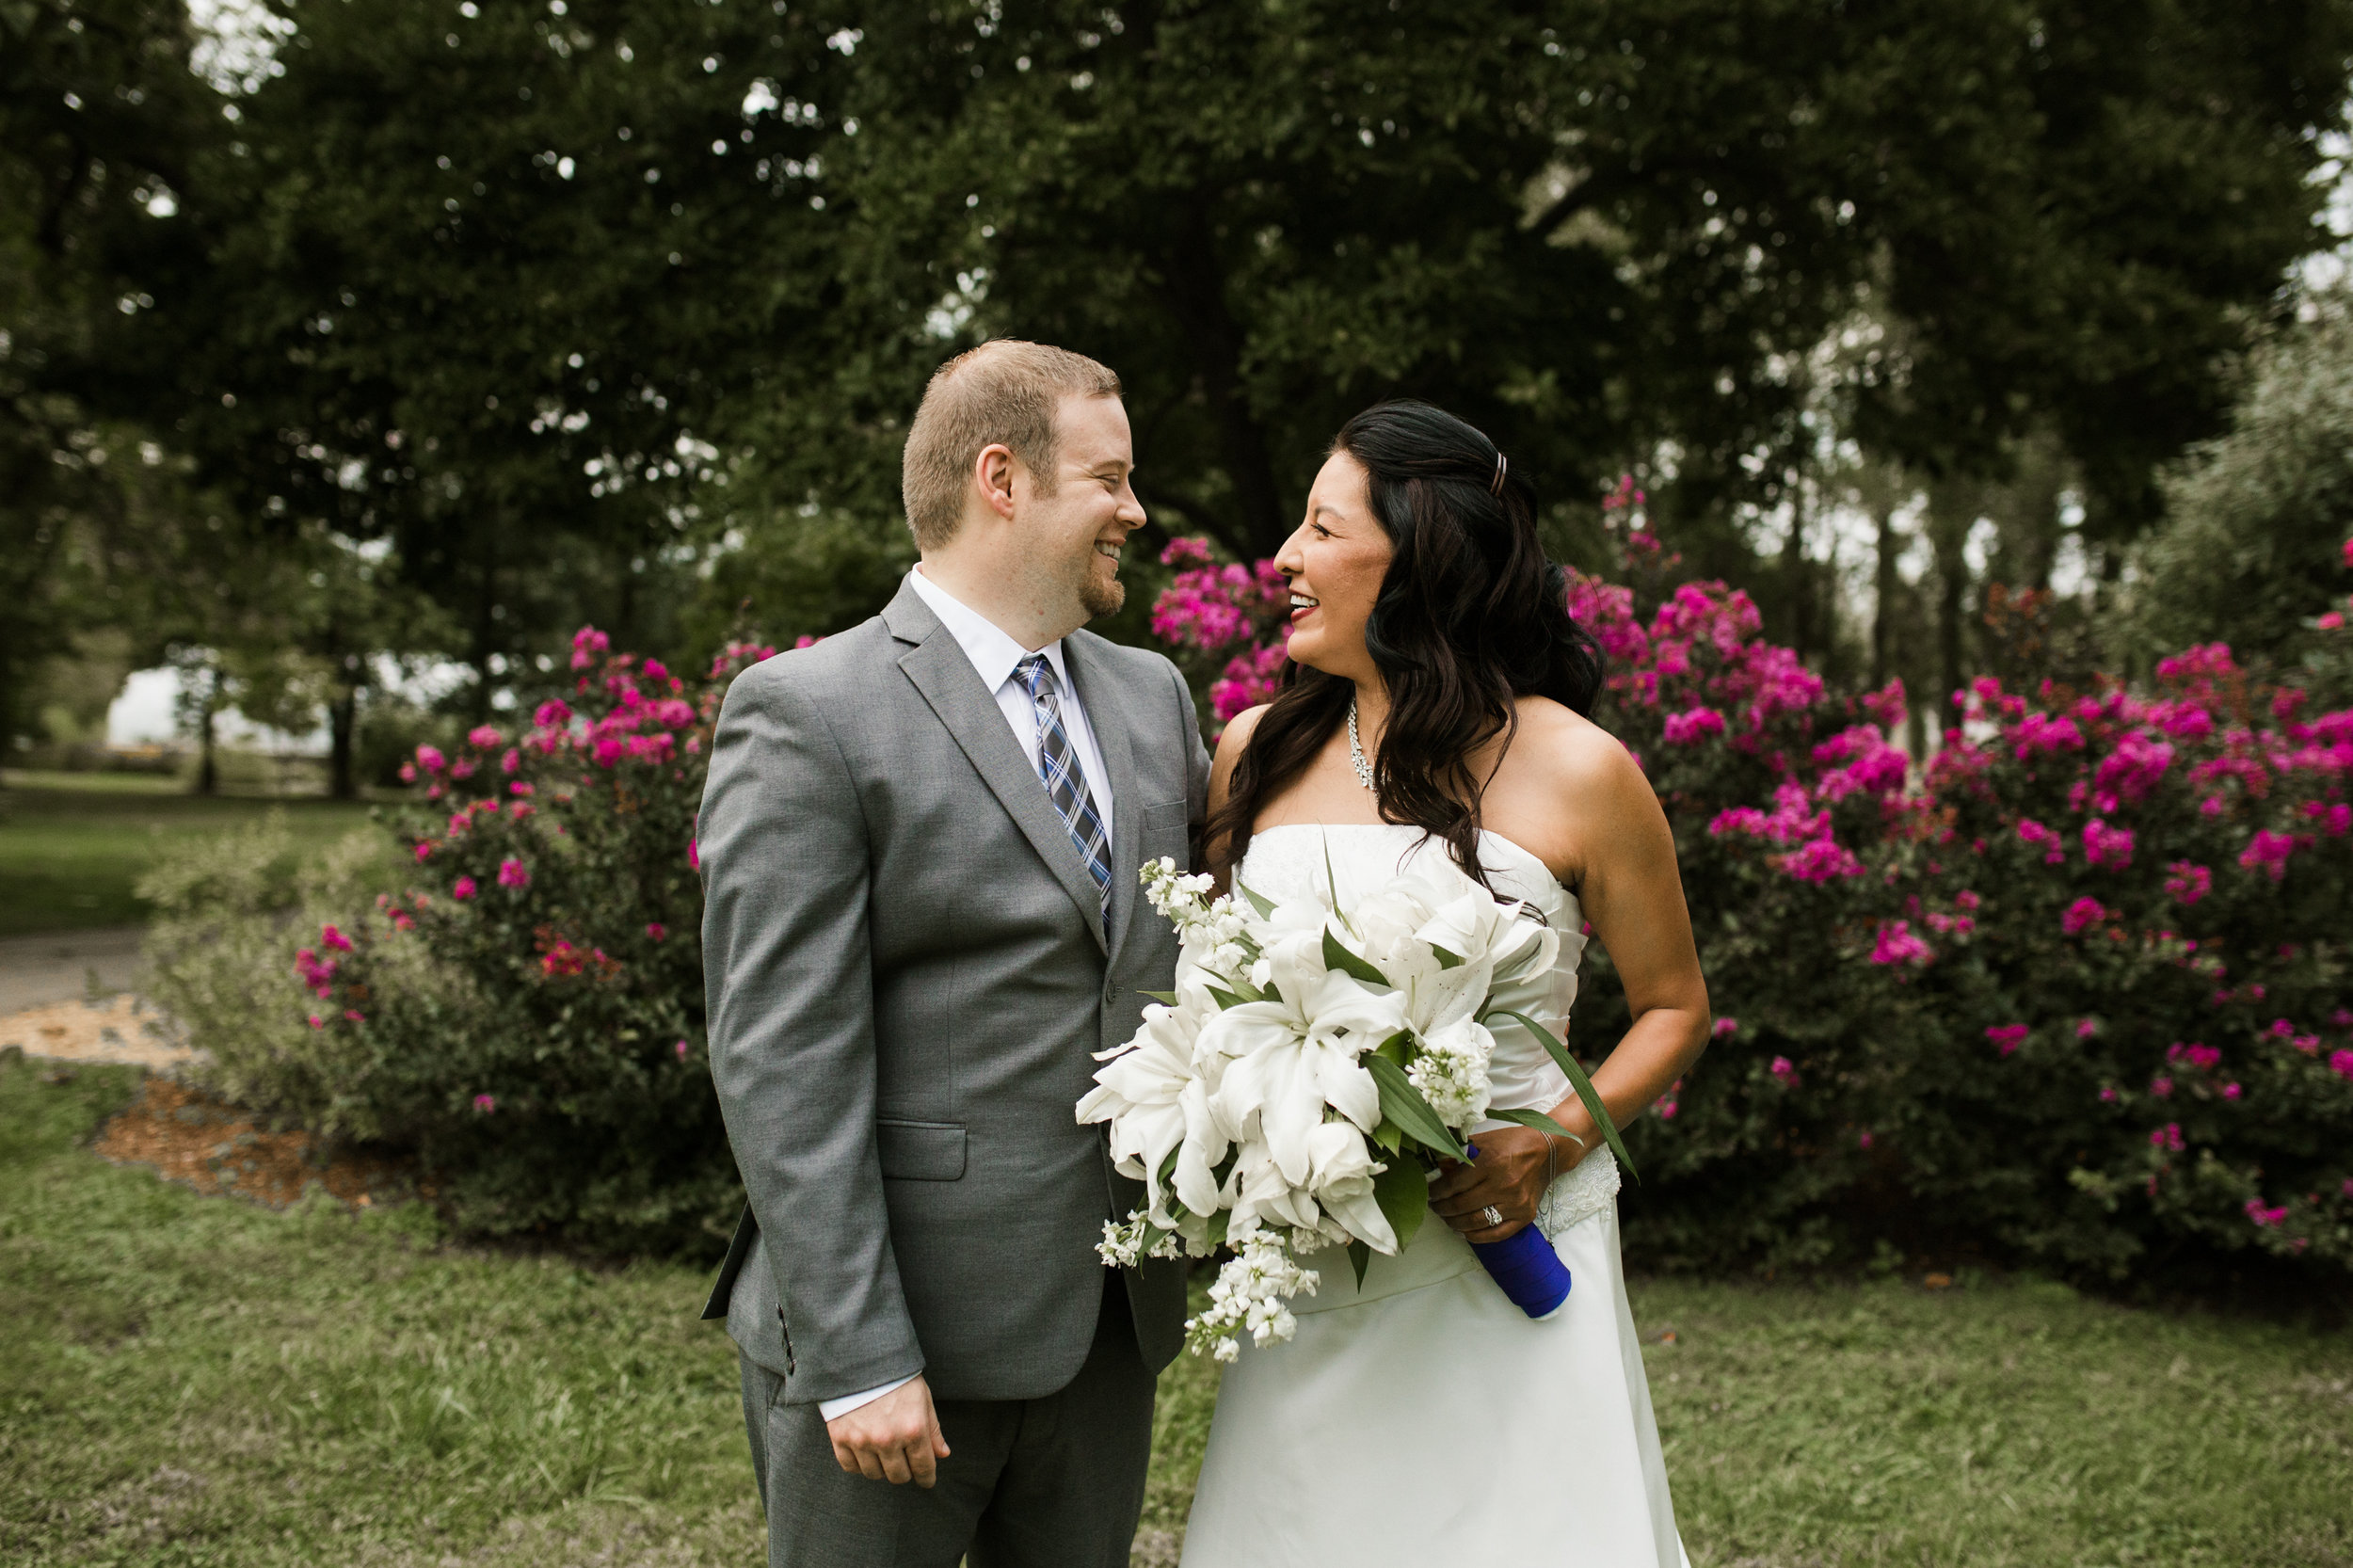 Kentucky Wedding Louisville Wedding Photographer 2018 Crystal Ludwick Photo Louisville Wedding Photographer Kentucky Wedding Photographer (61 of 76).jpg